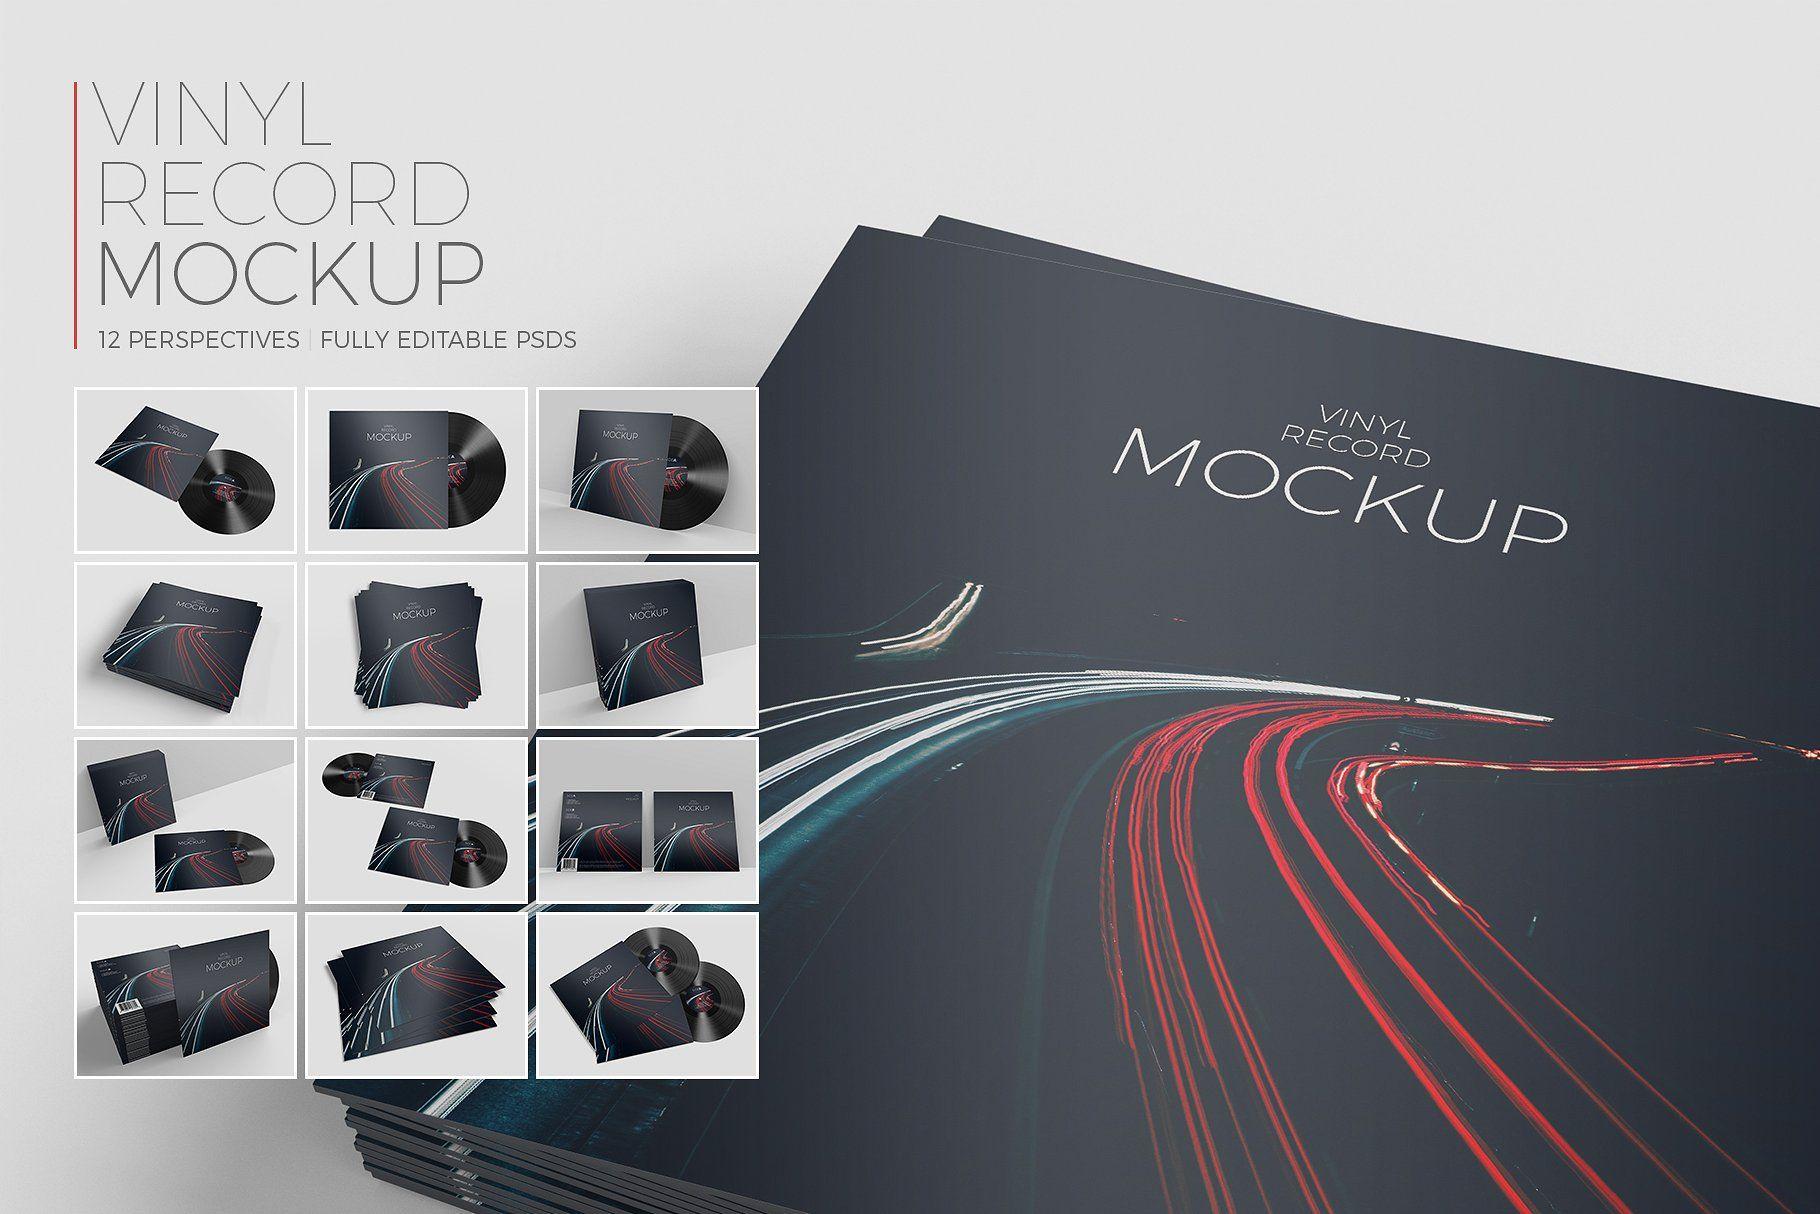 Download Vinyl Record Mockup Mockup Vinyl Records Freelance Graphic Design